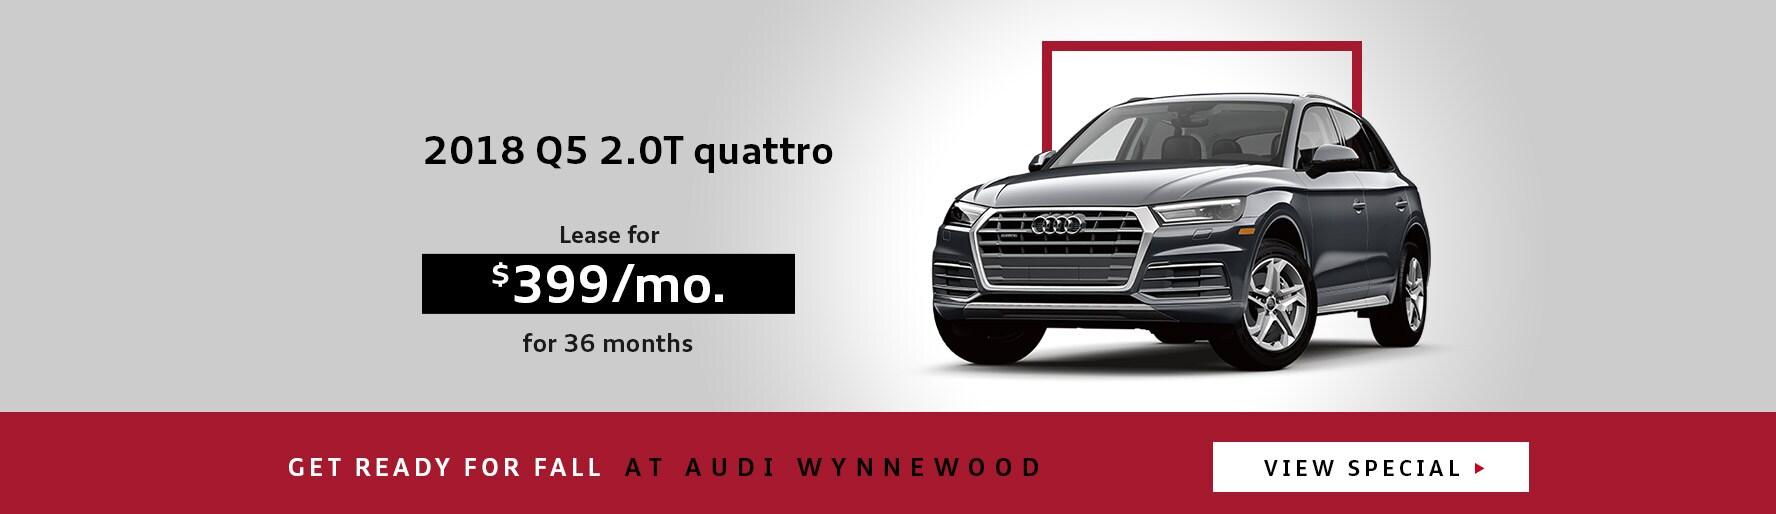 Audi Wynnewood Audi Dealership Near Philadelphia PA - Audi wynnewood